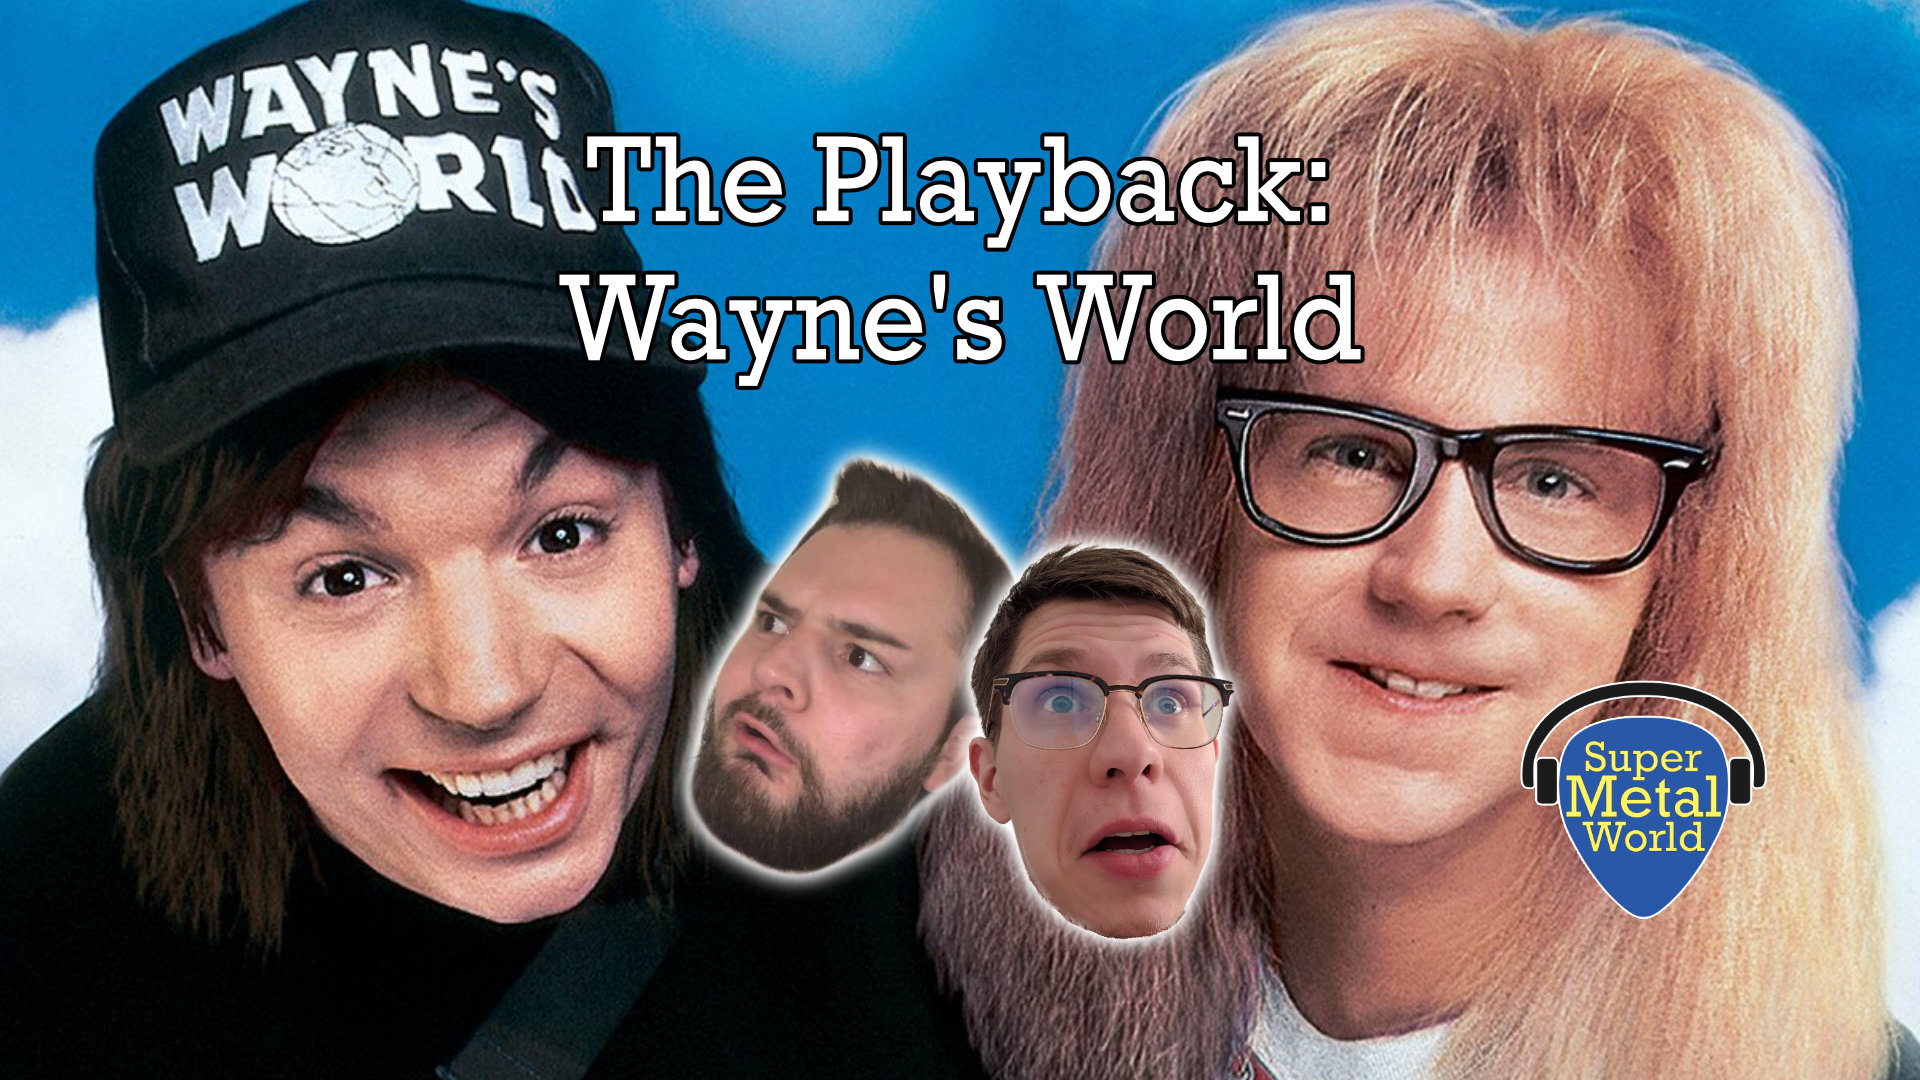 The Playback Waynes World Super Metal World